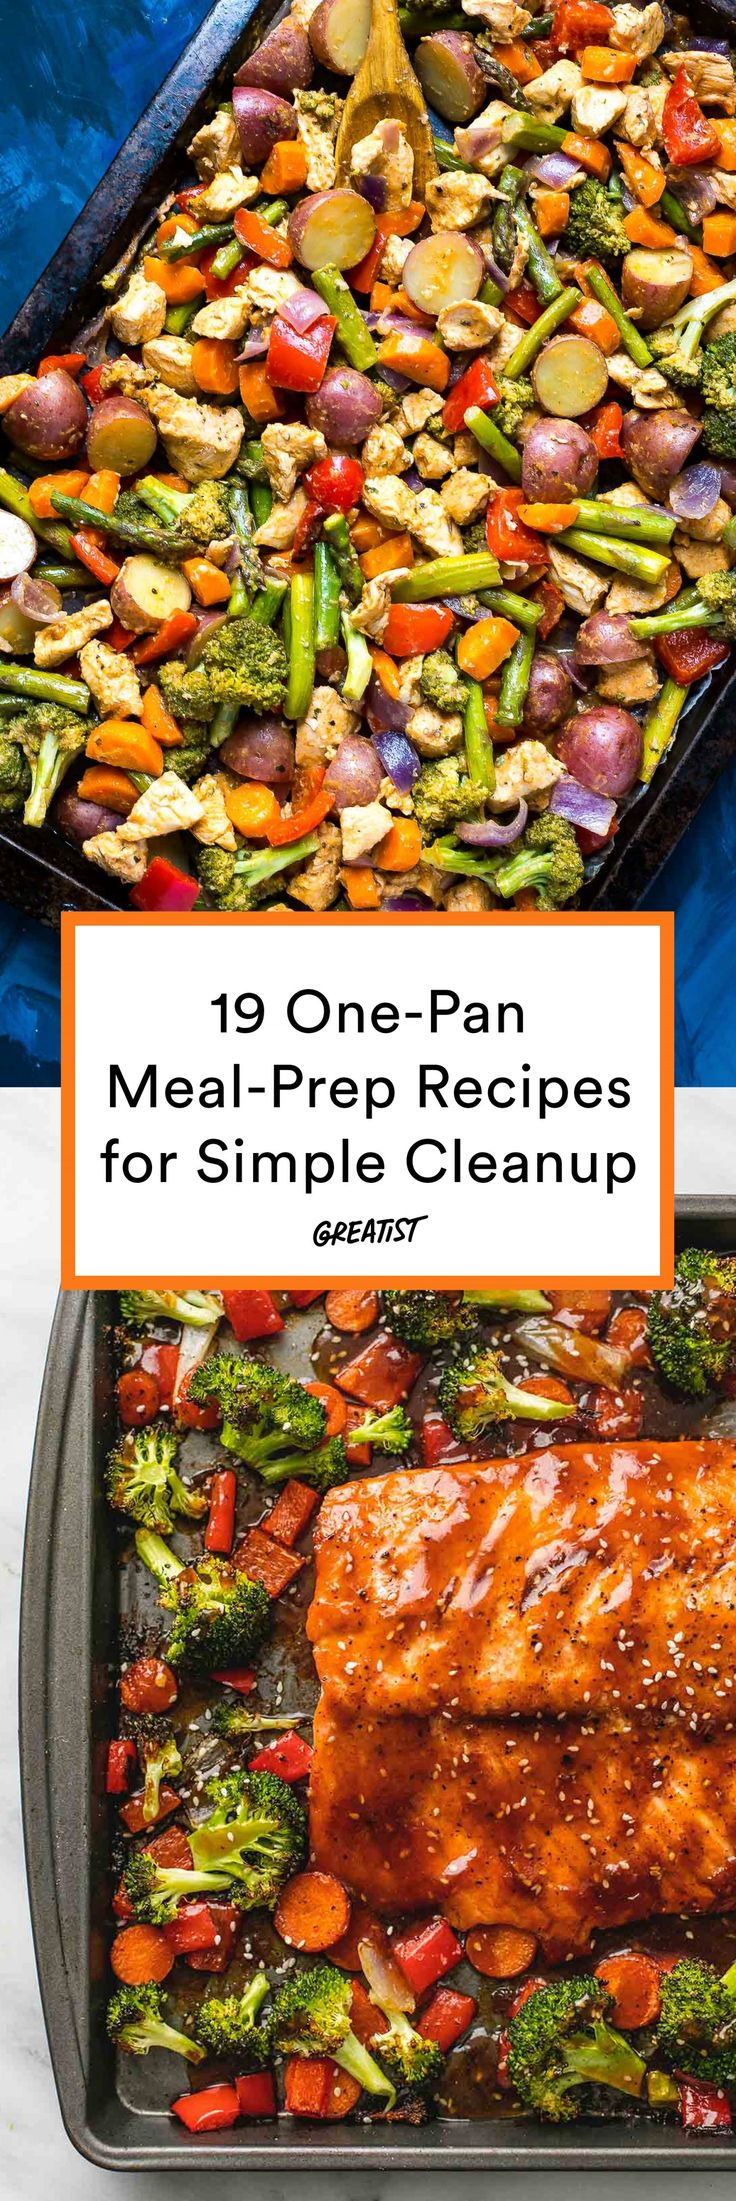 Keepin' cleanup simple since 2017. #greatist https://greatist.com/eat/one-pan-meal-prep-recipes